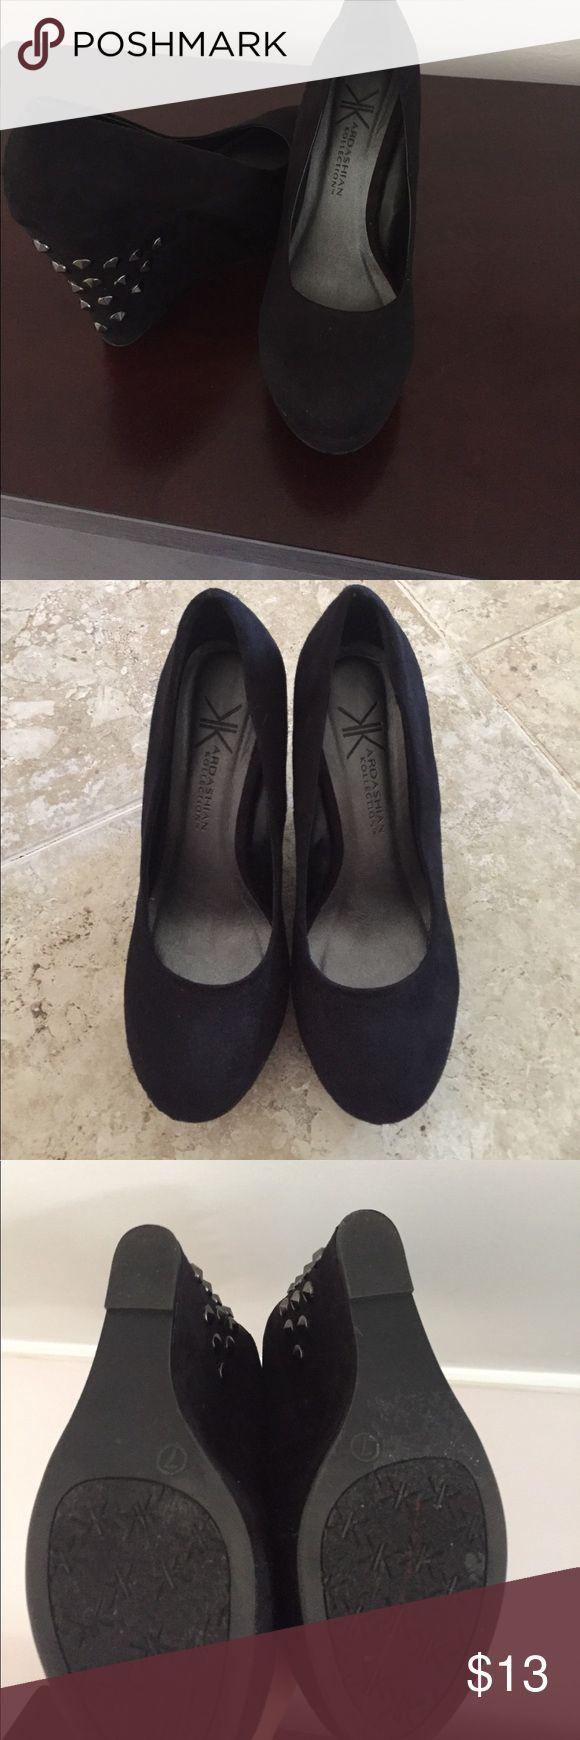 Black Studded Kardashian Kollection Wedges. Size 7 Kardashian Kollection wedges. Size 7 Kardashian Kollection Shoes Wedges